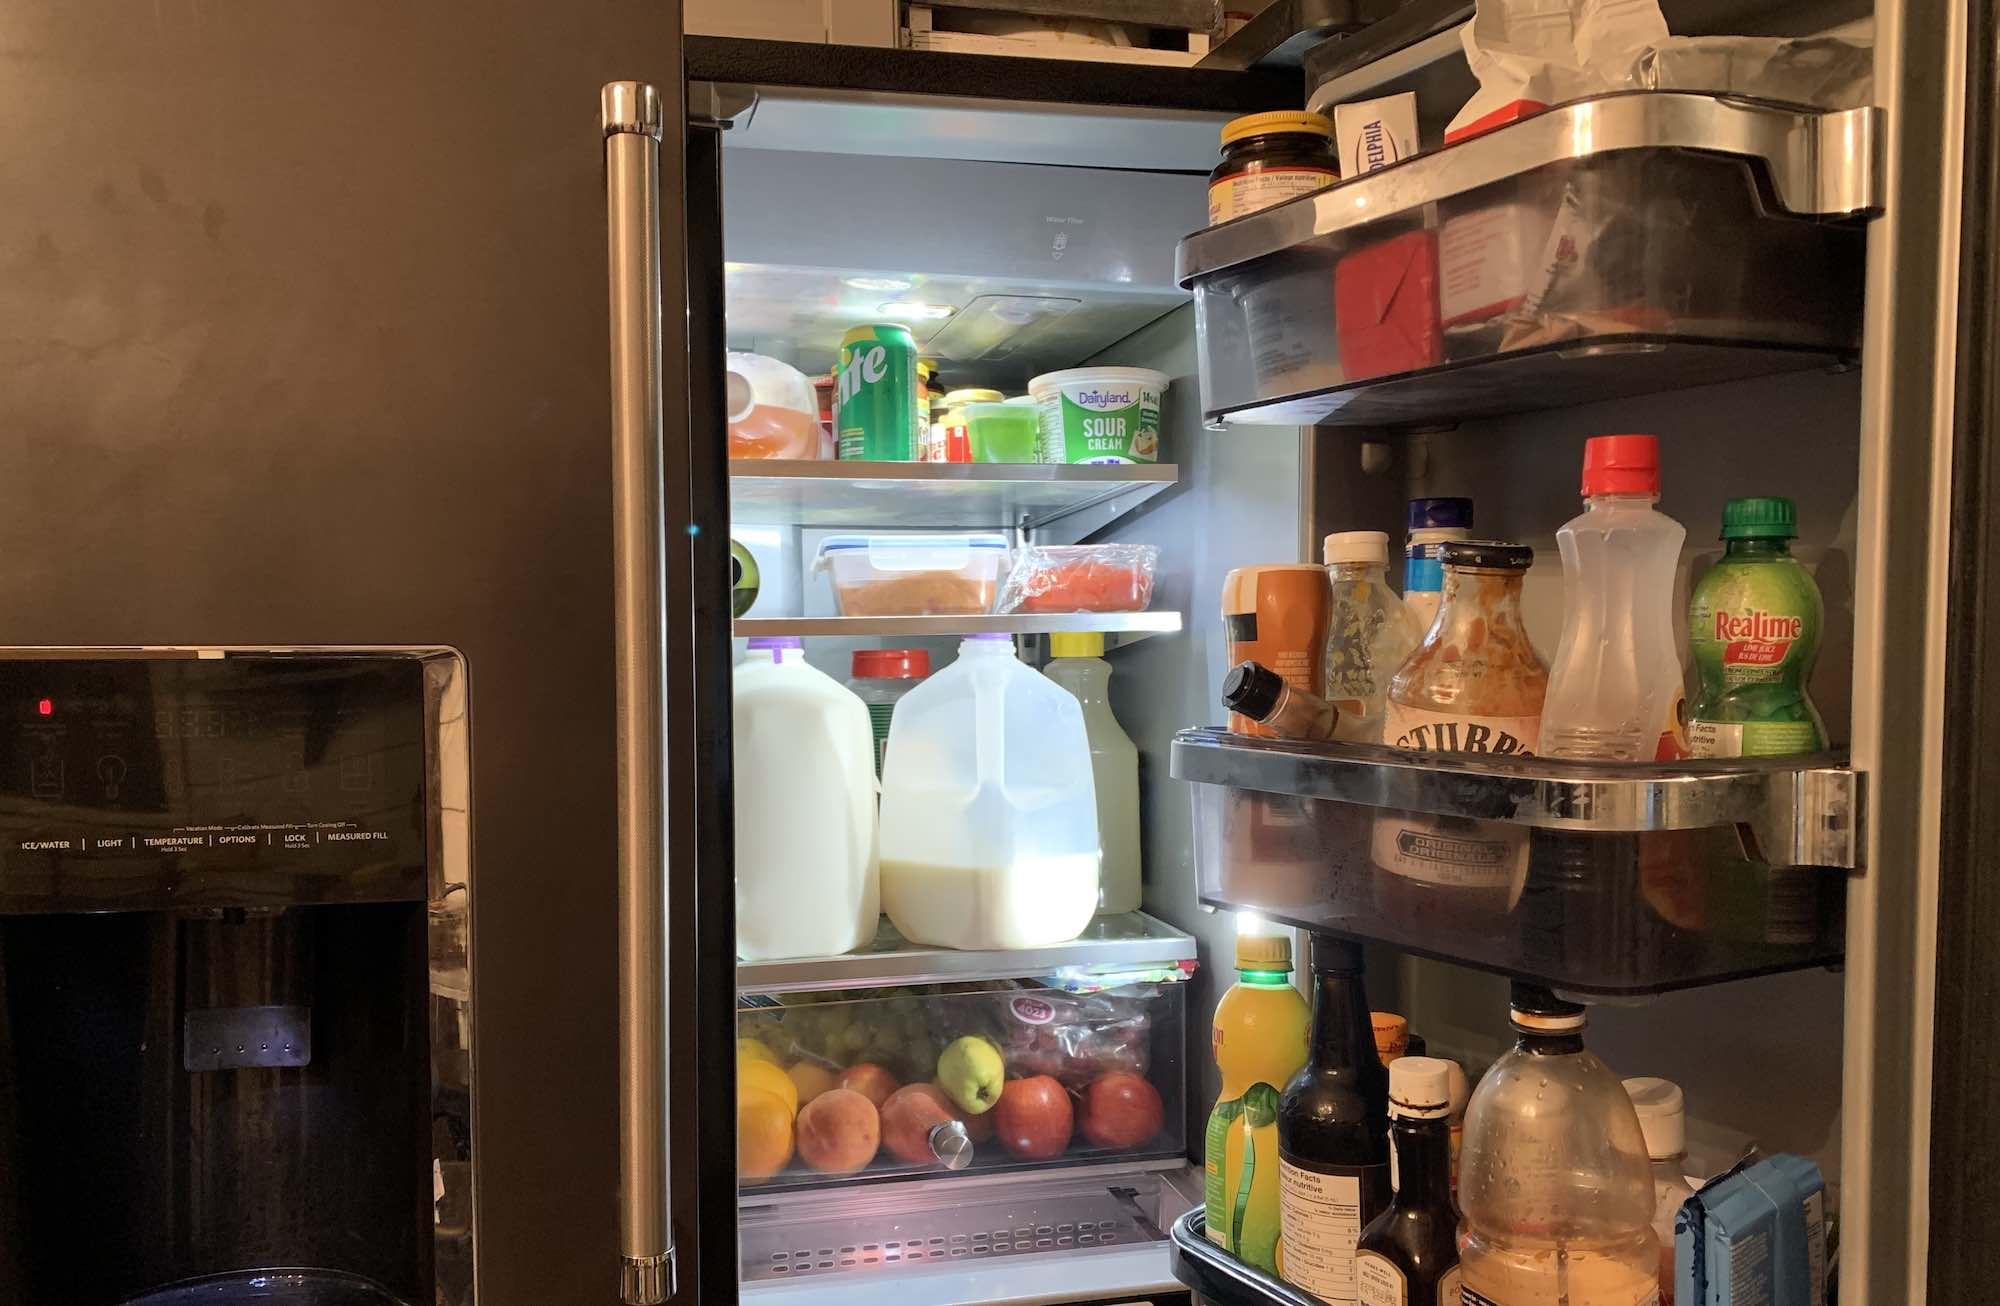 KitchenAid fridge side bins